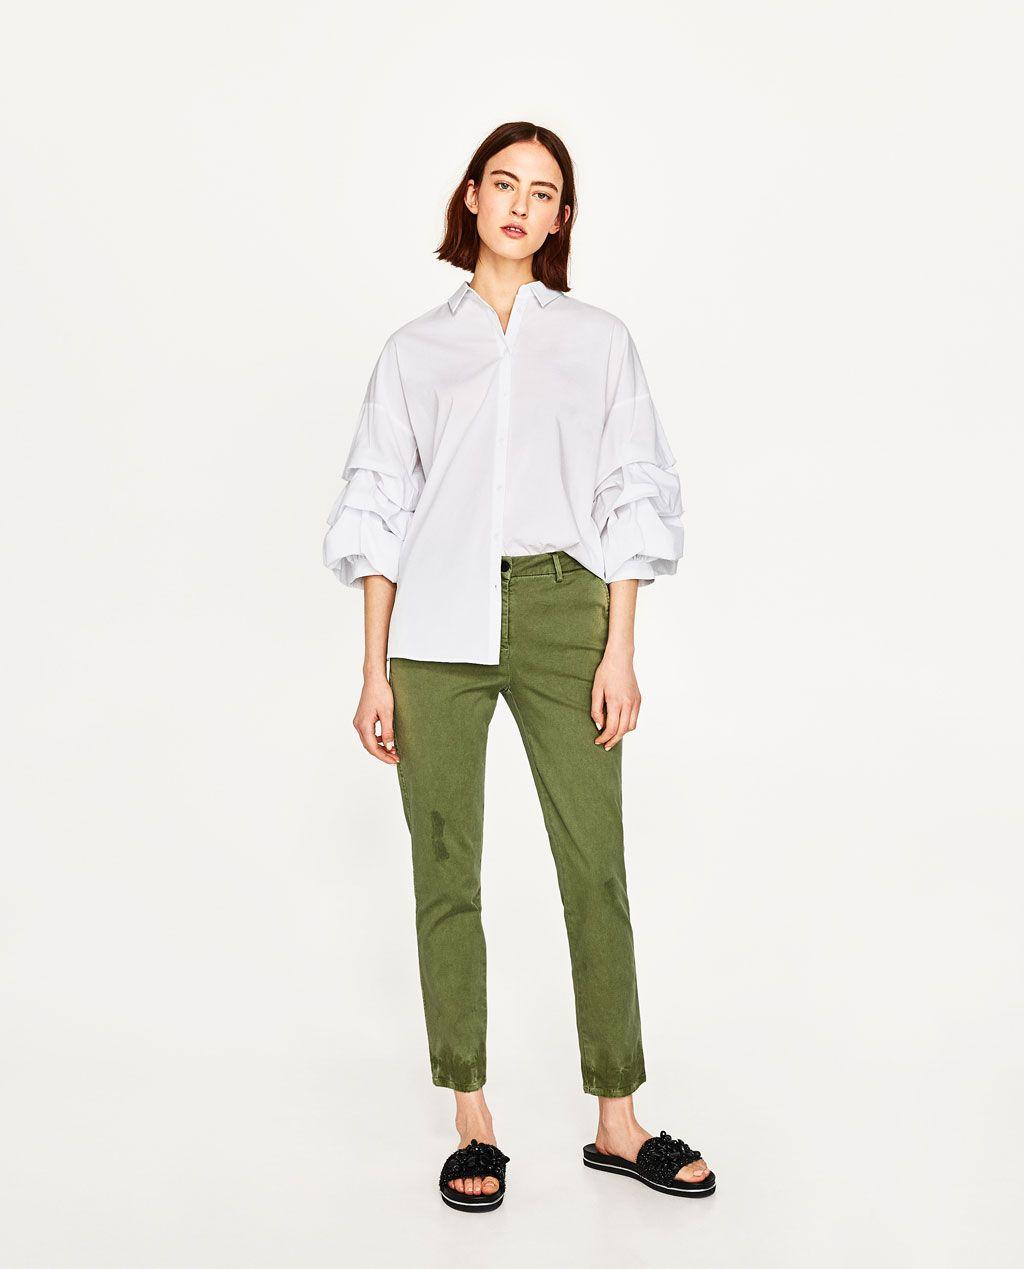 Pantalon Chino Envies Pinterest Pantalones Verdes Pantalones